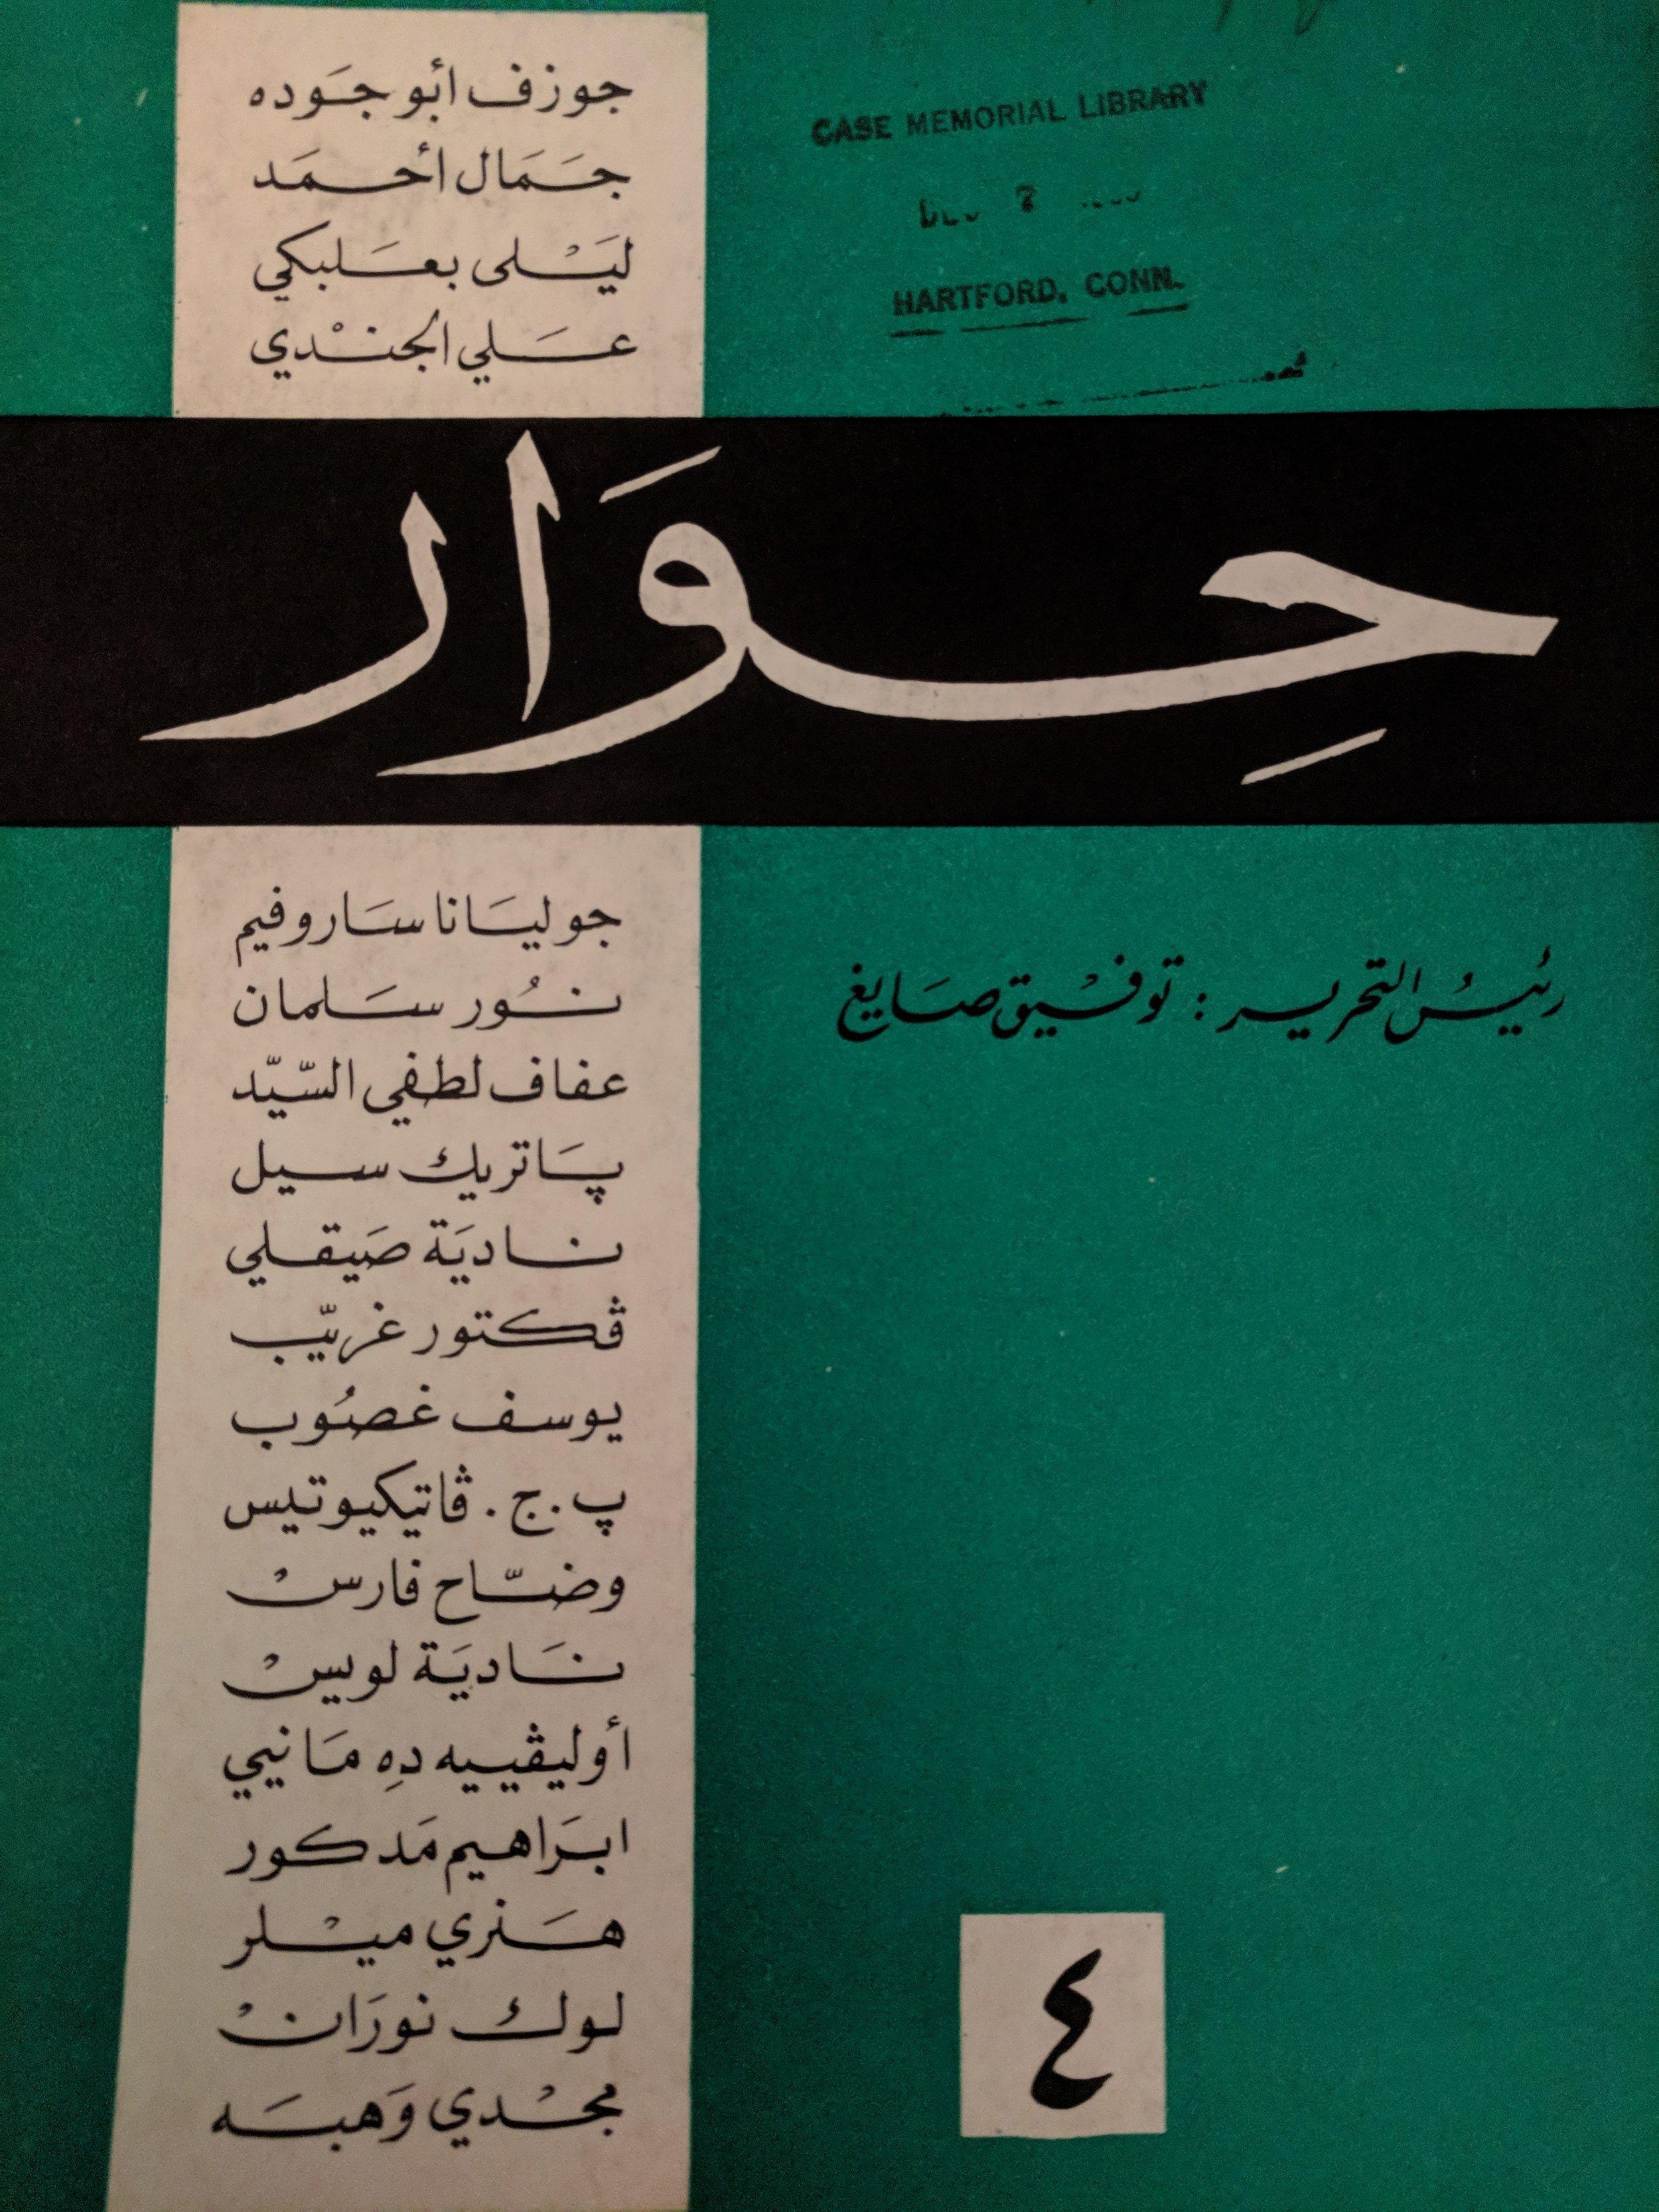 hiwar 4 - 1963